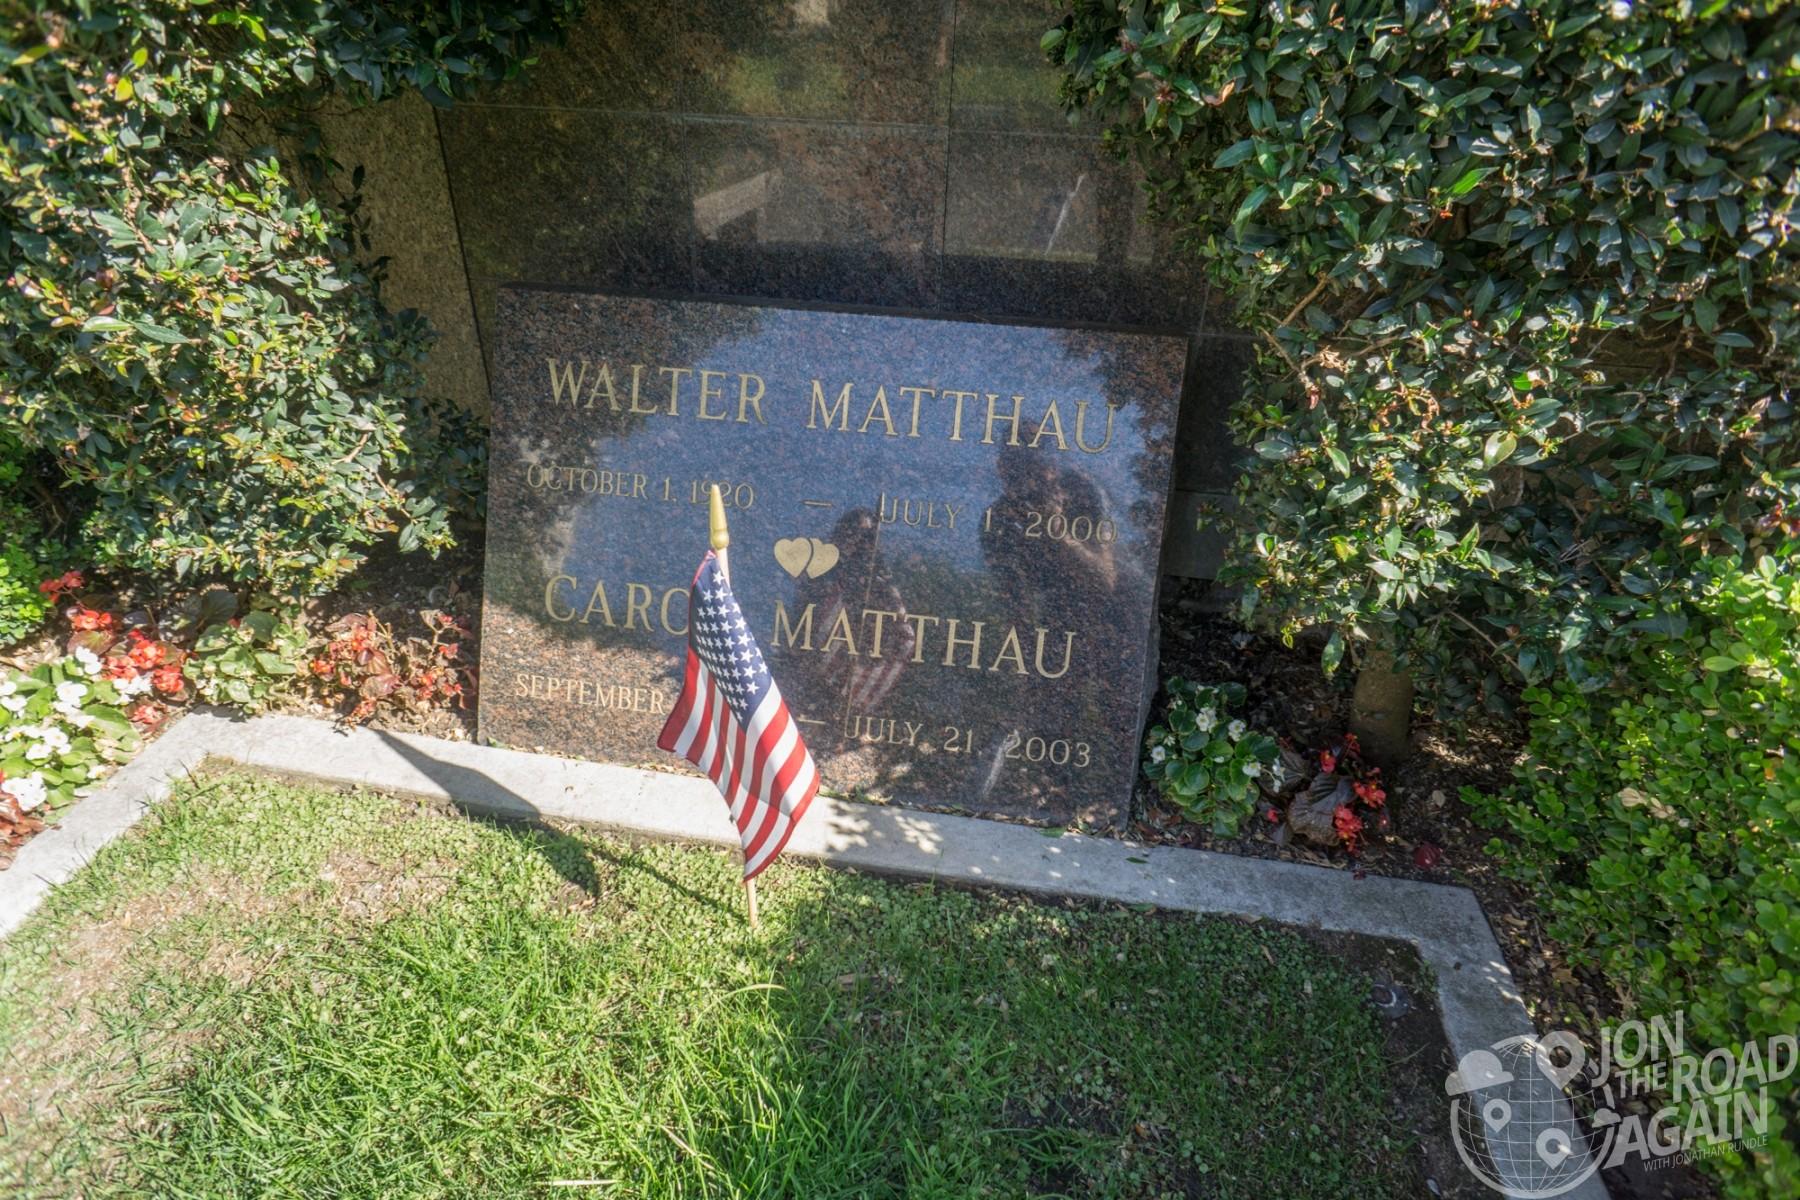 Walter Matthau grave